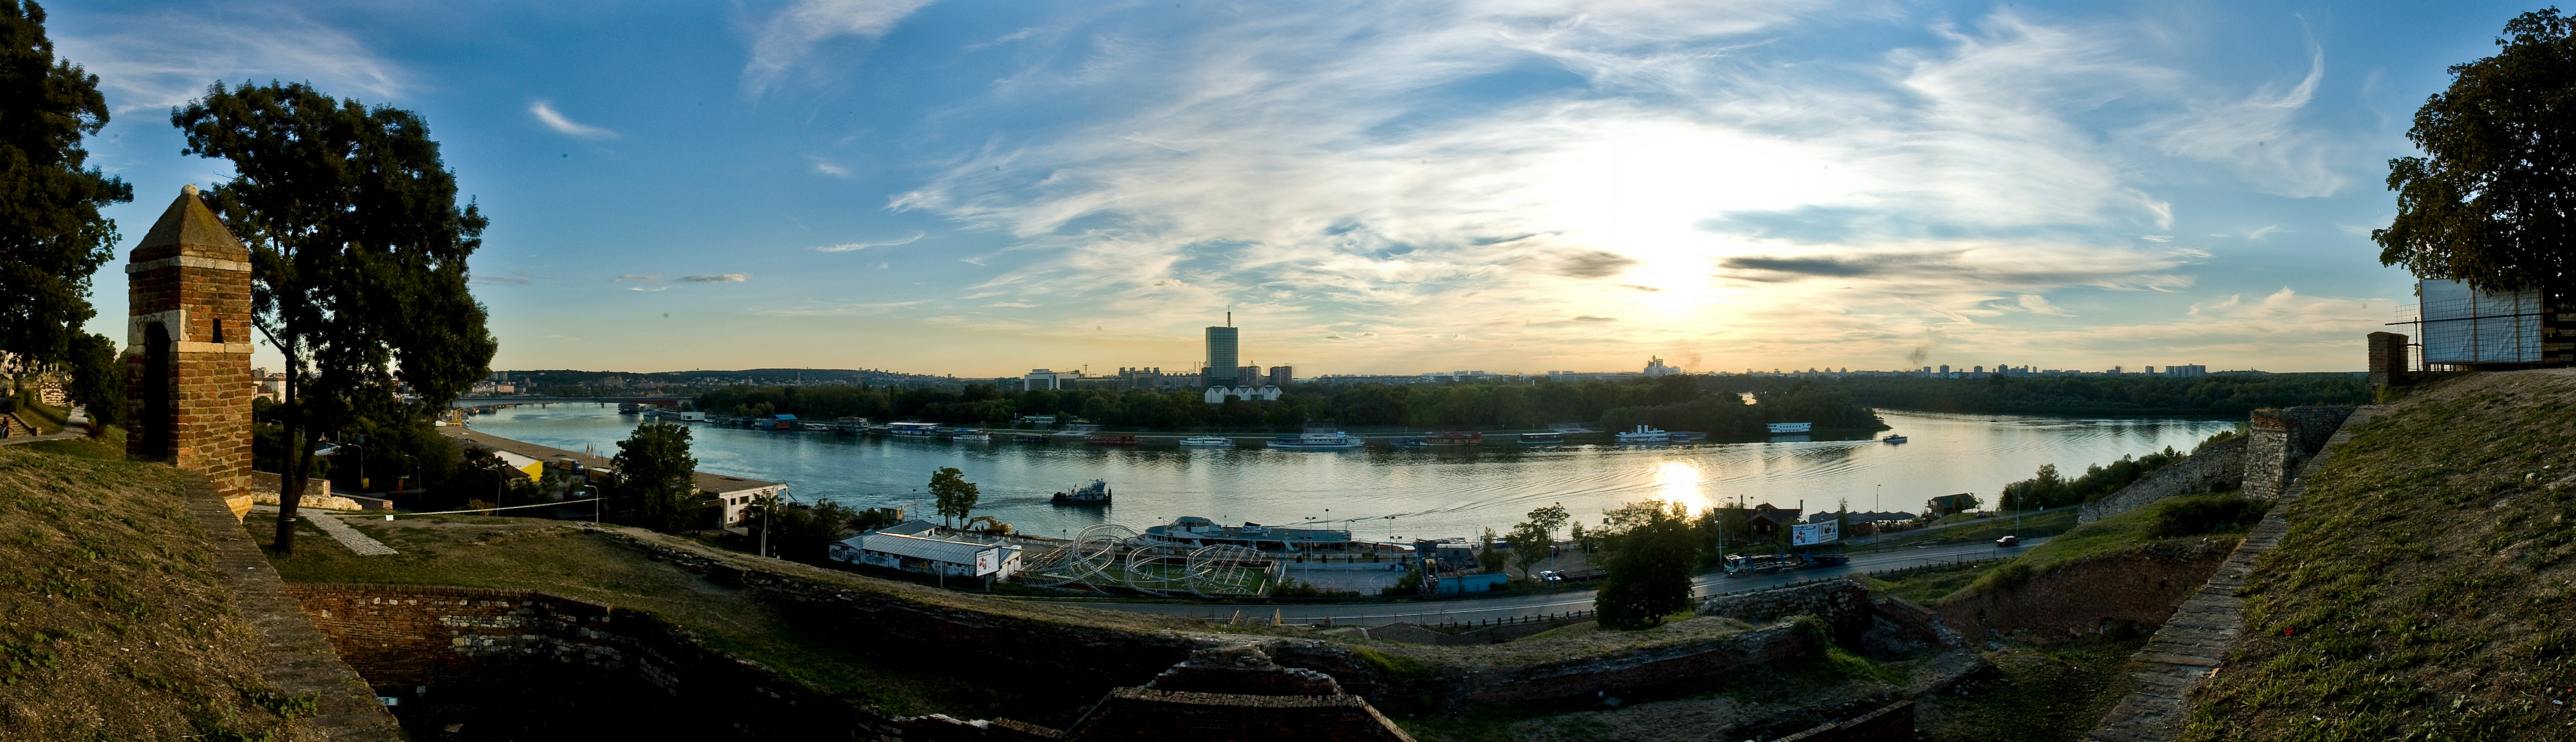 Belgrade Serbia  City pictures : Datei:Sava river in Belgrade, Serbia – Wikipedia